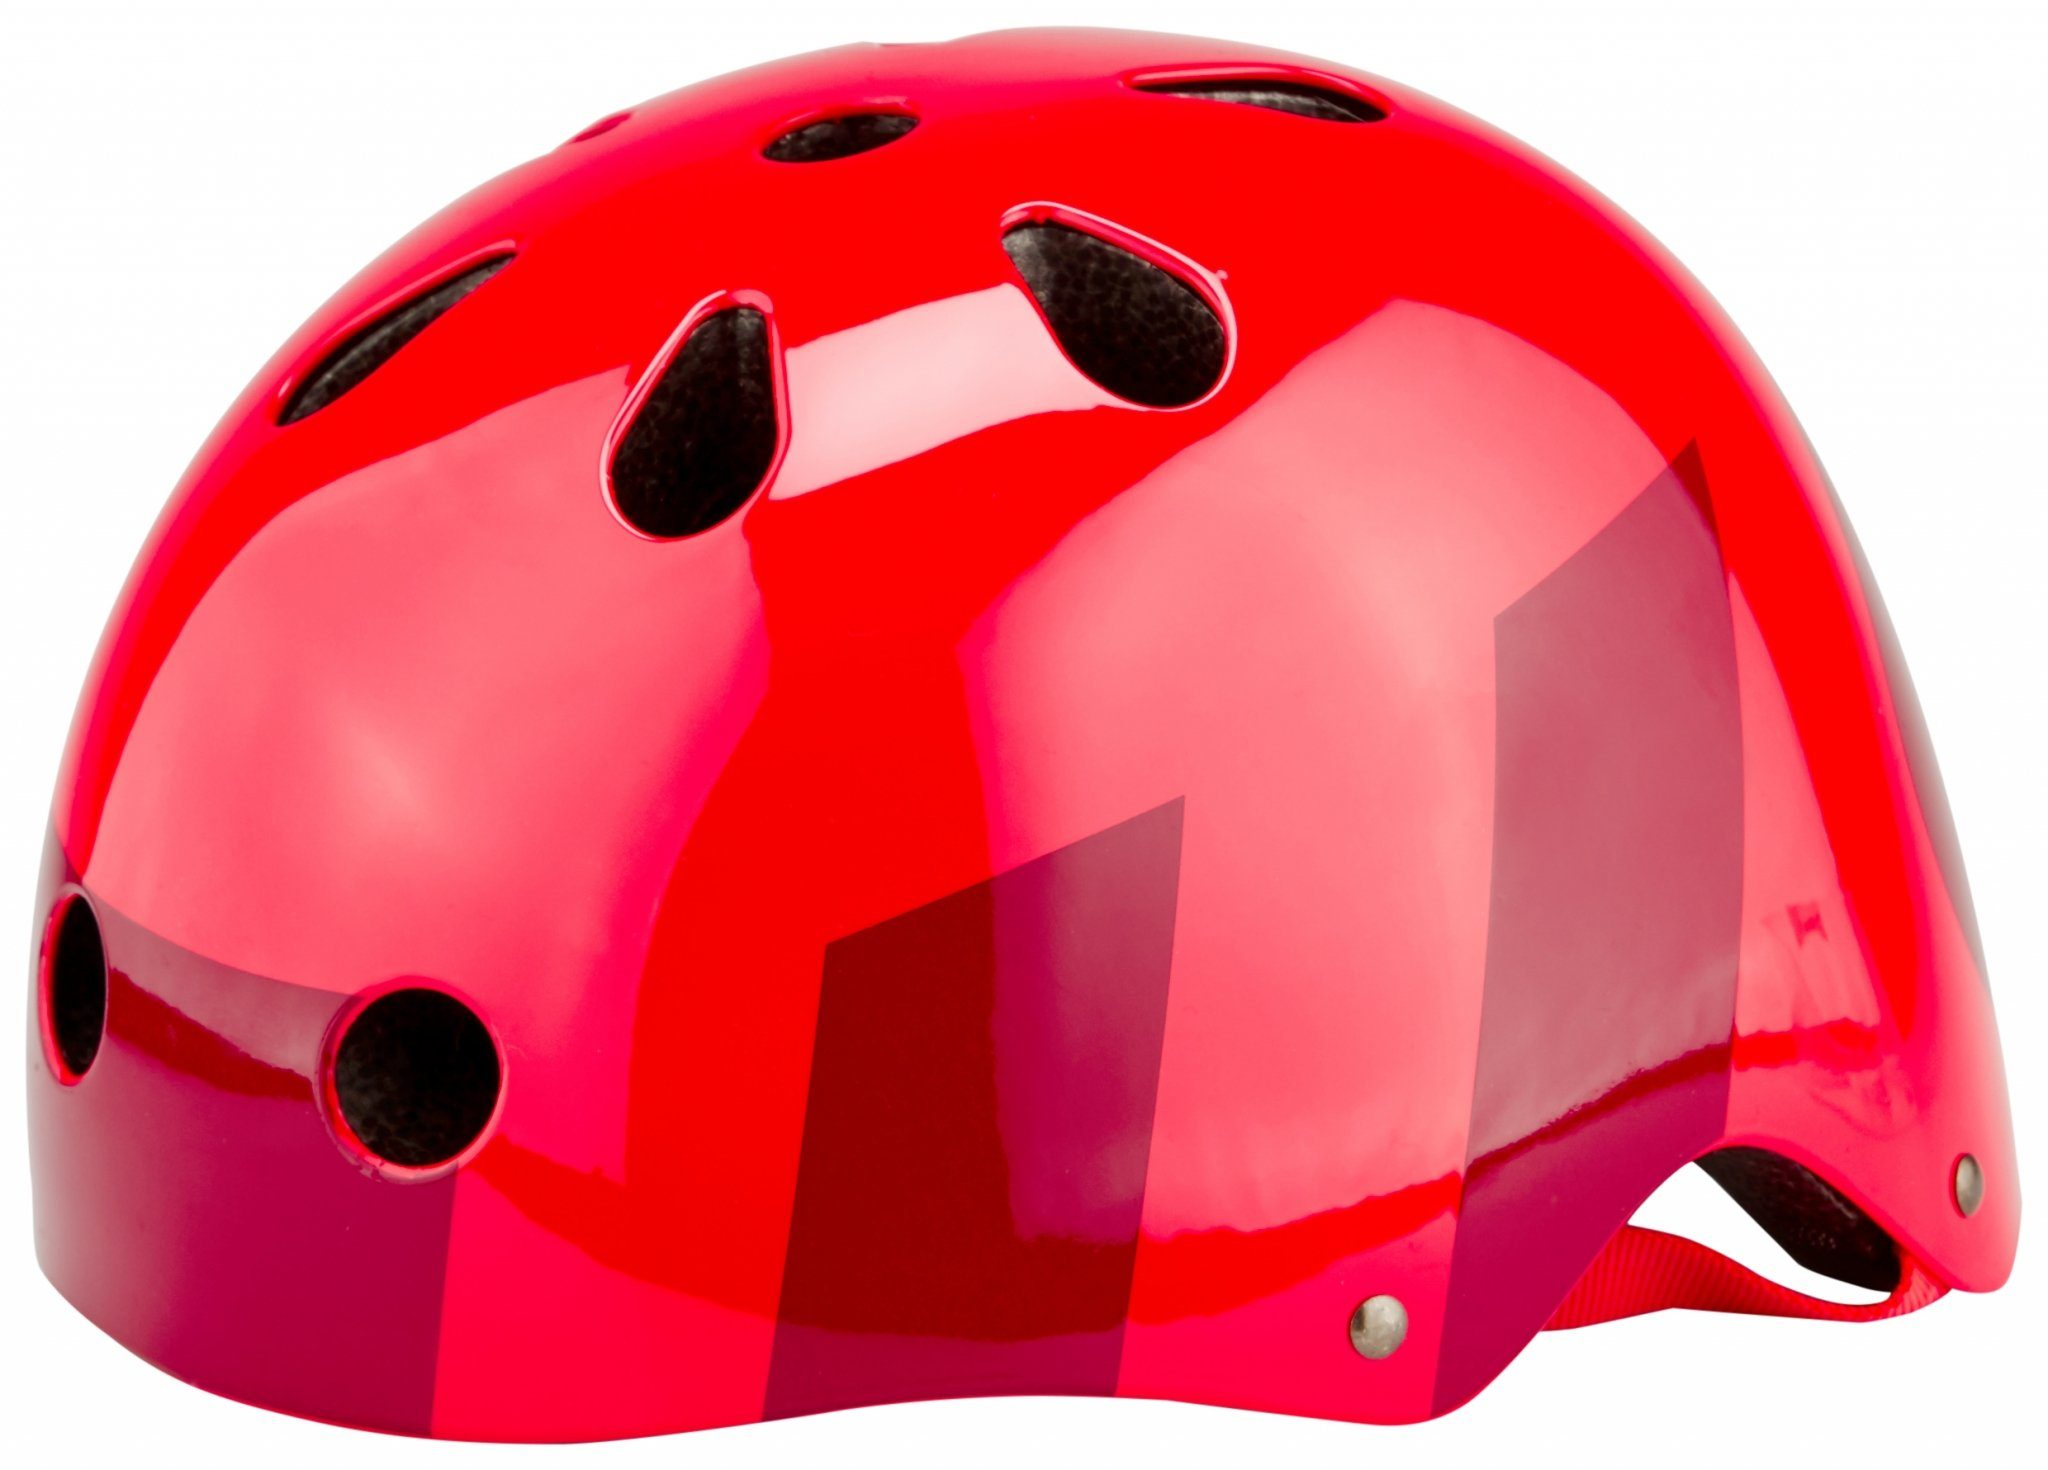 SixSixOne Fahrradhelm »Dirt Lid Helmet«